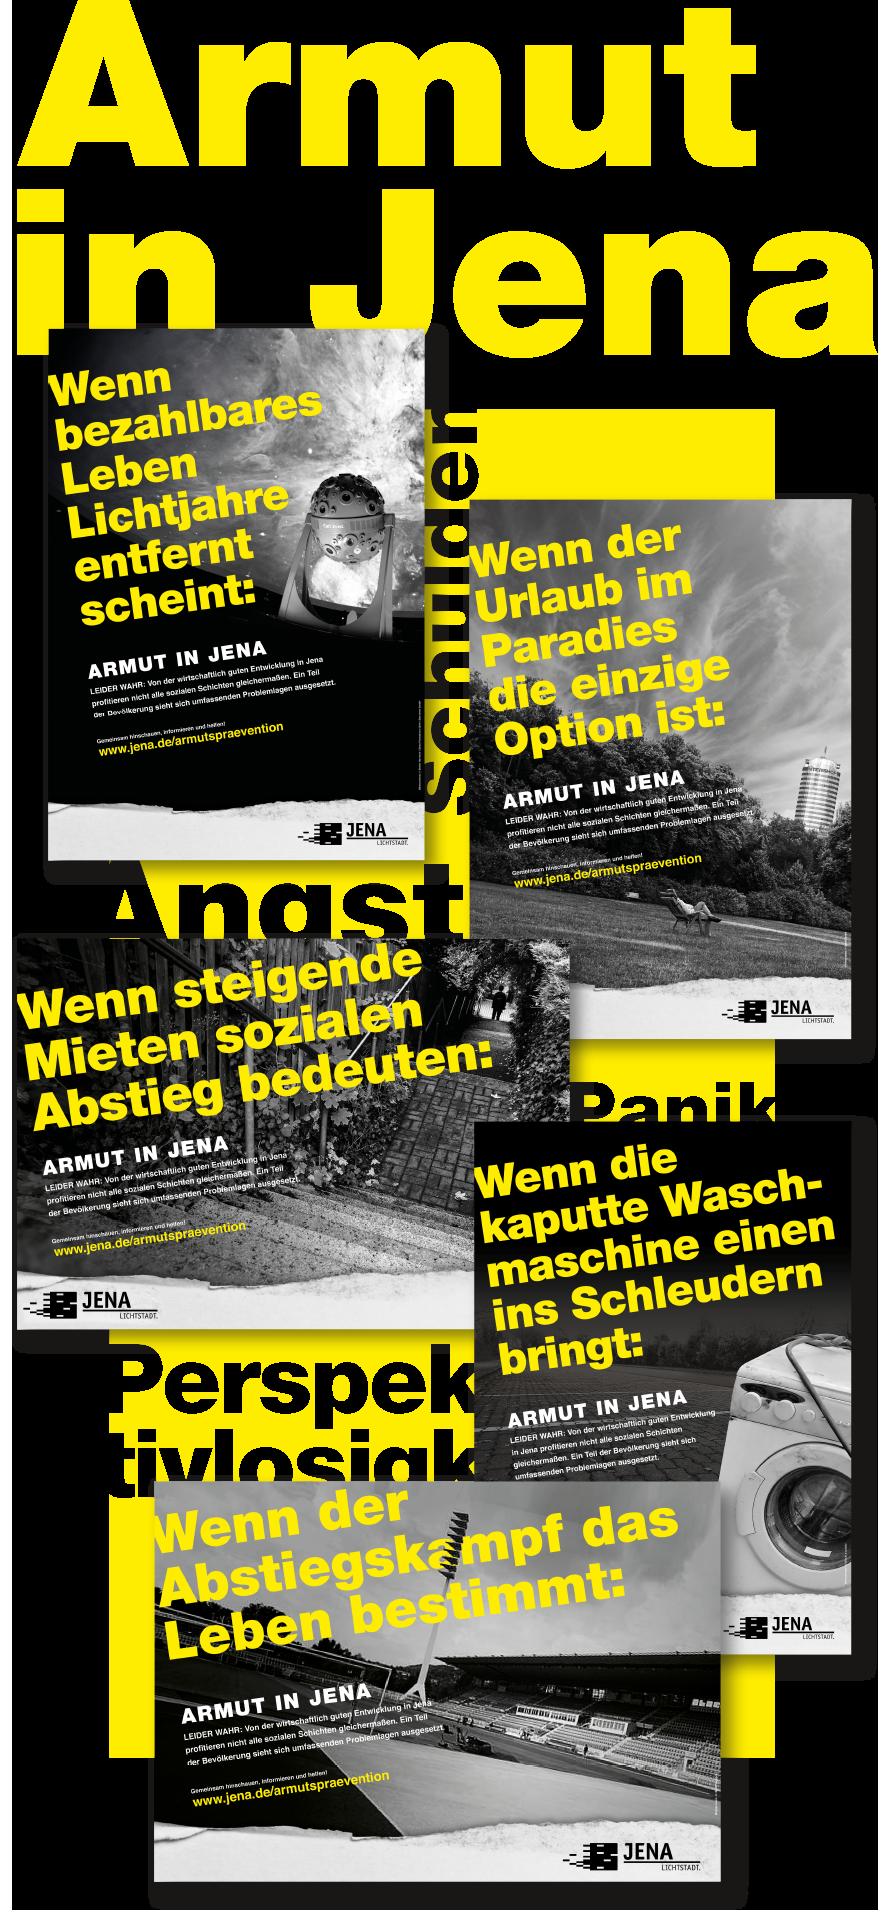 Samt&Seidel_Referenz_Jena_Armutskampagne_Collage